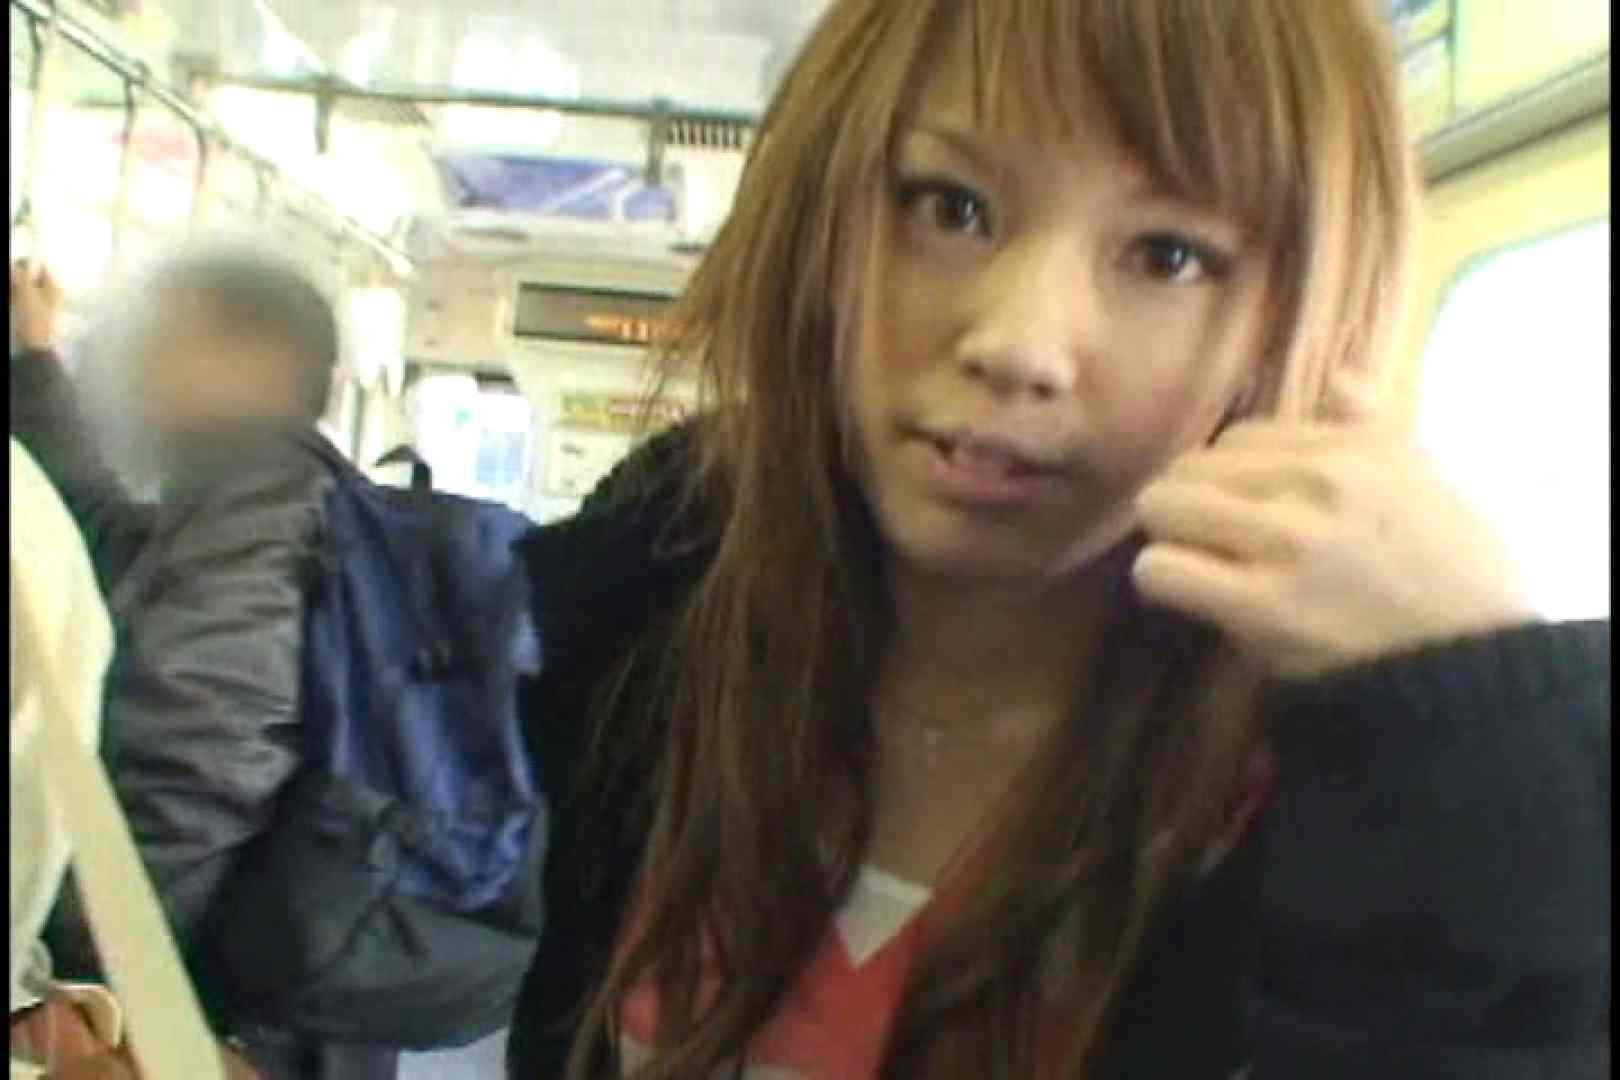 JDハンター全国ツアー vol.017 前編 女子大生のエロ生活   OLのエロ生活  66連発 23